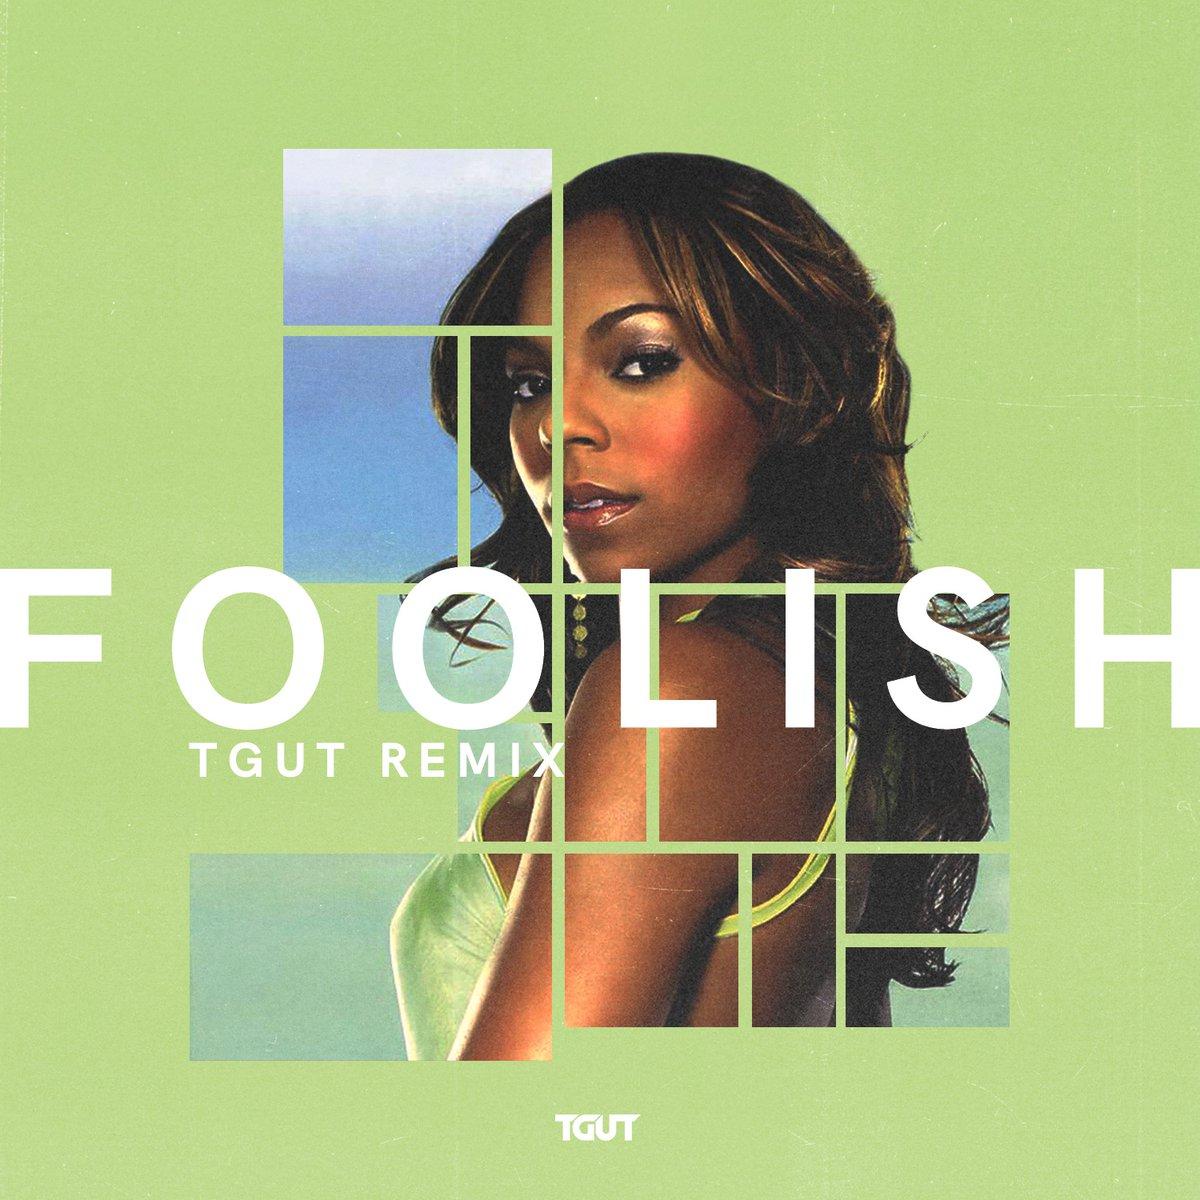 TGUT – foolish (TGUT remix)